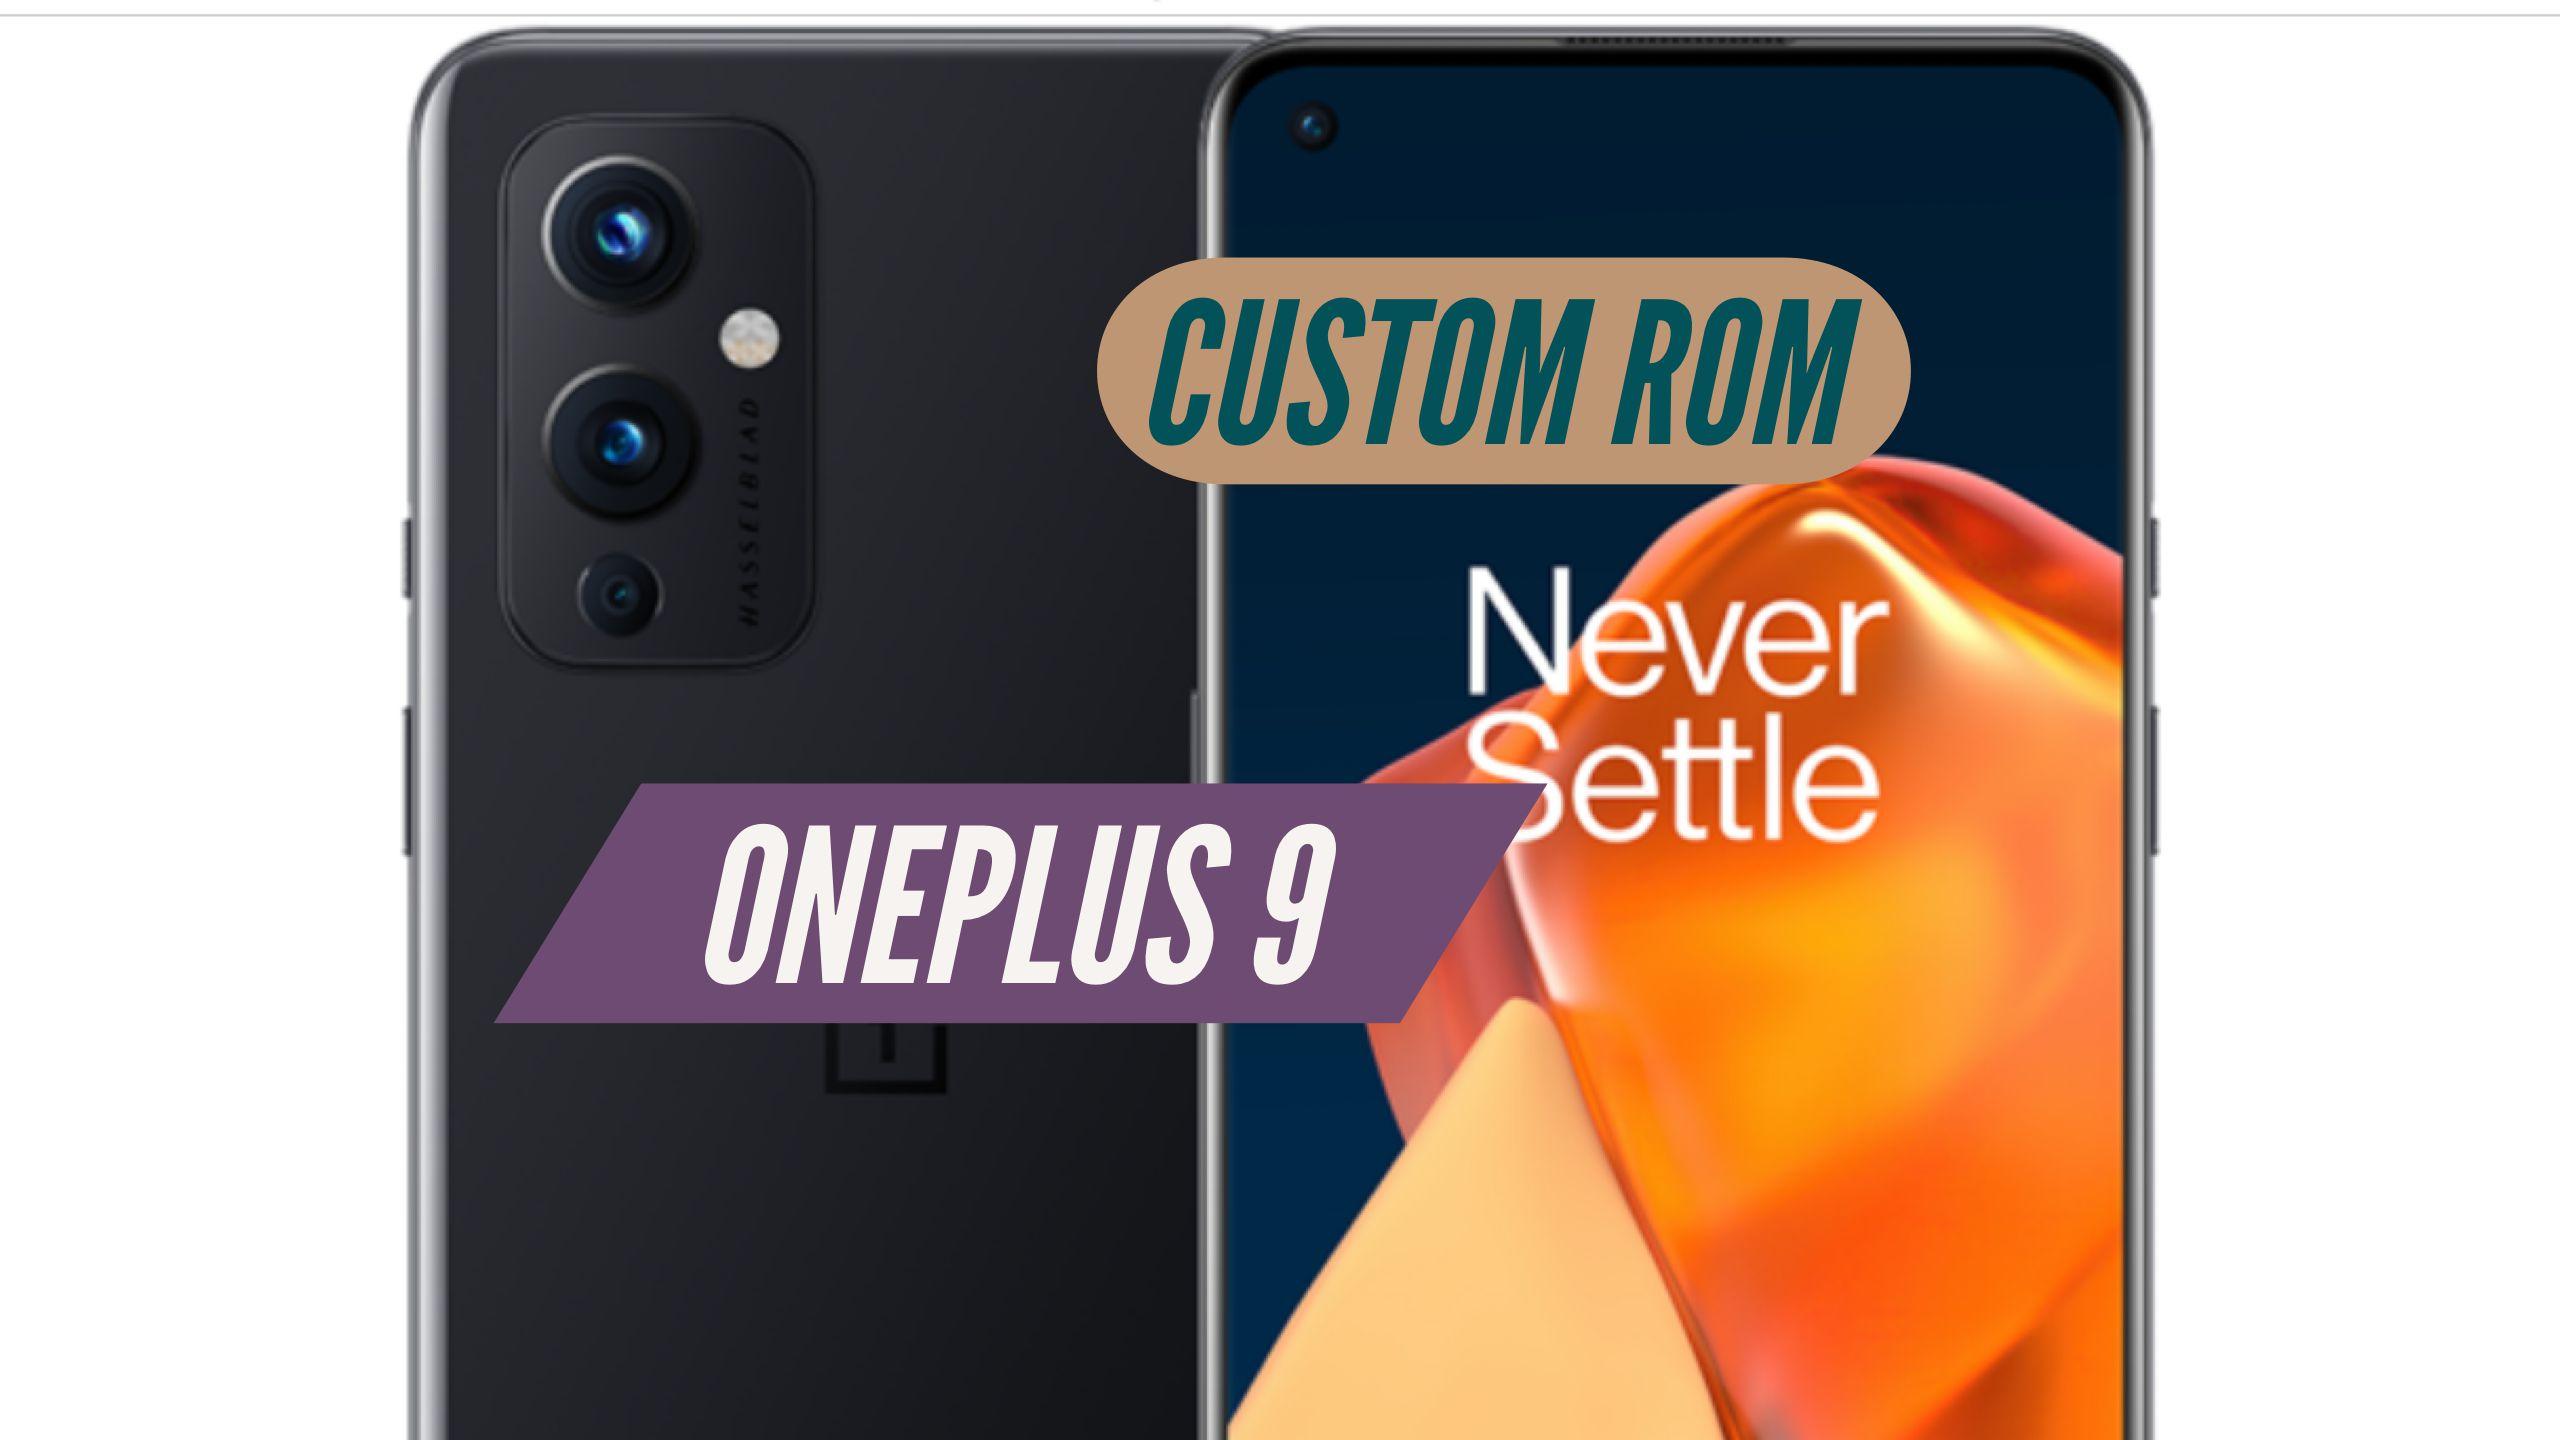 OnePlus 9 Custom ROm